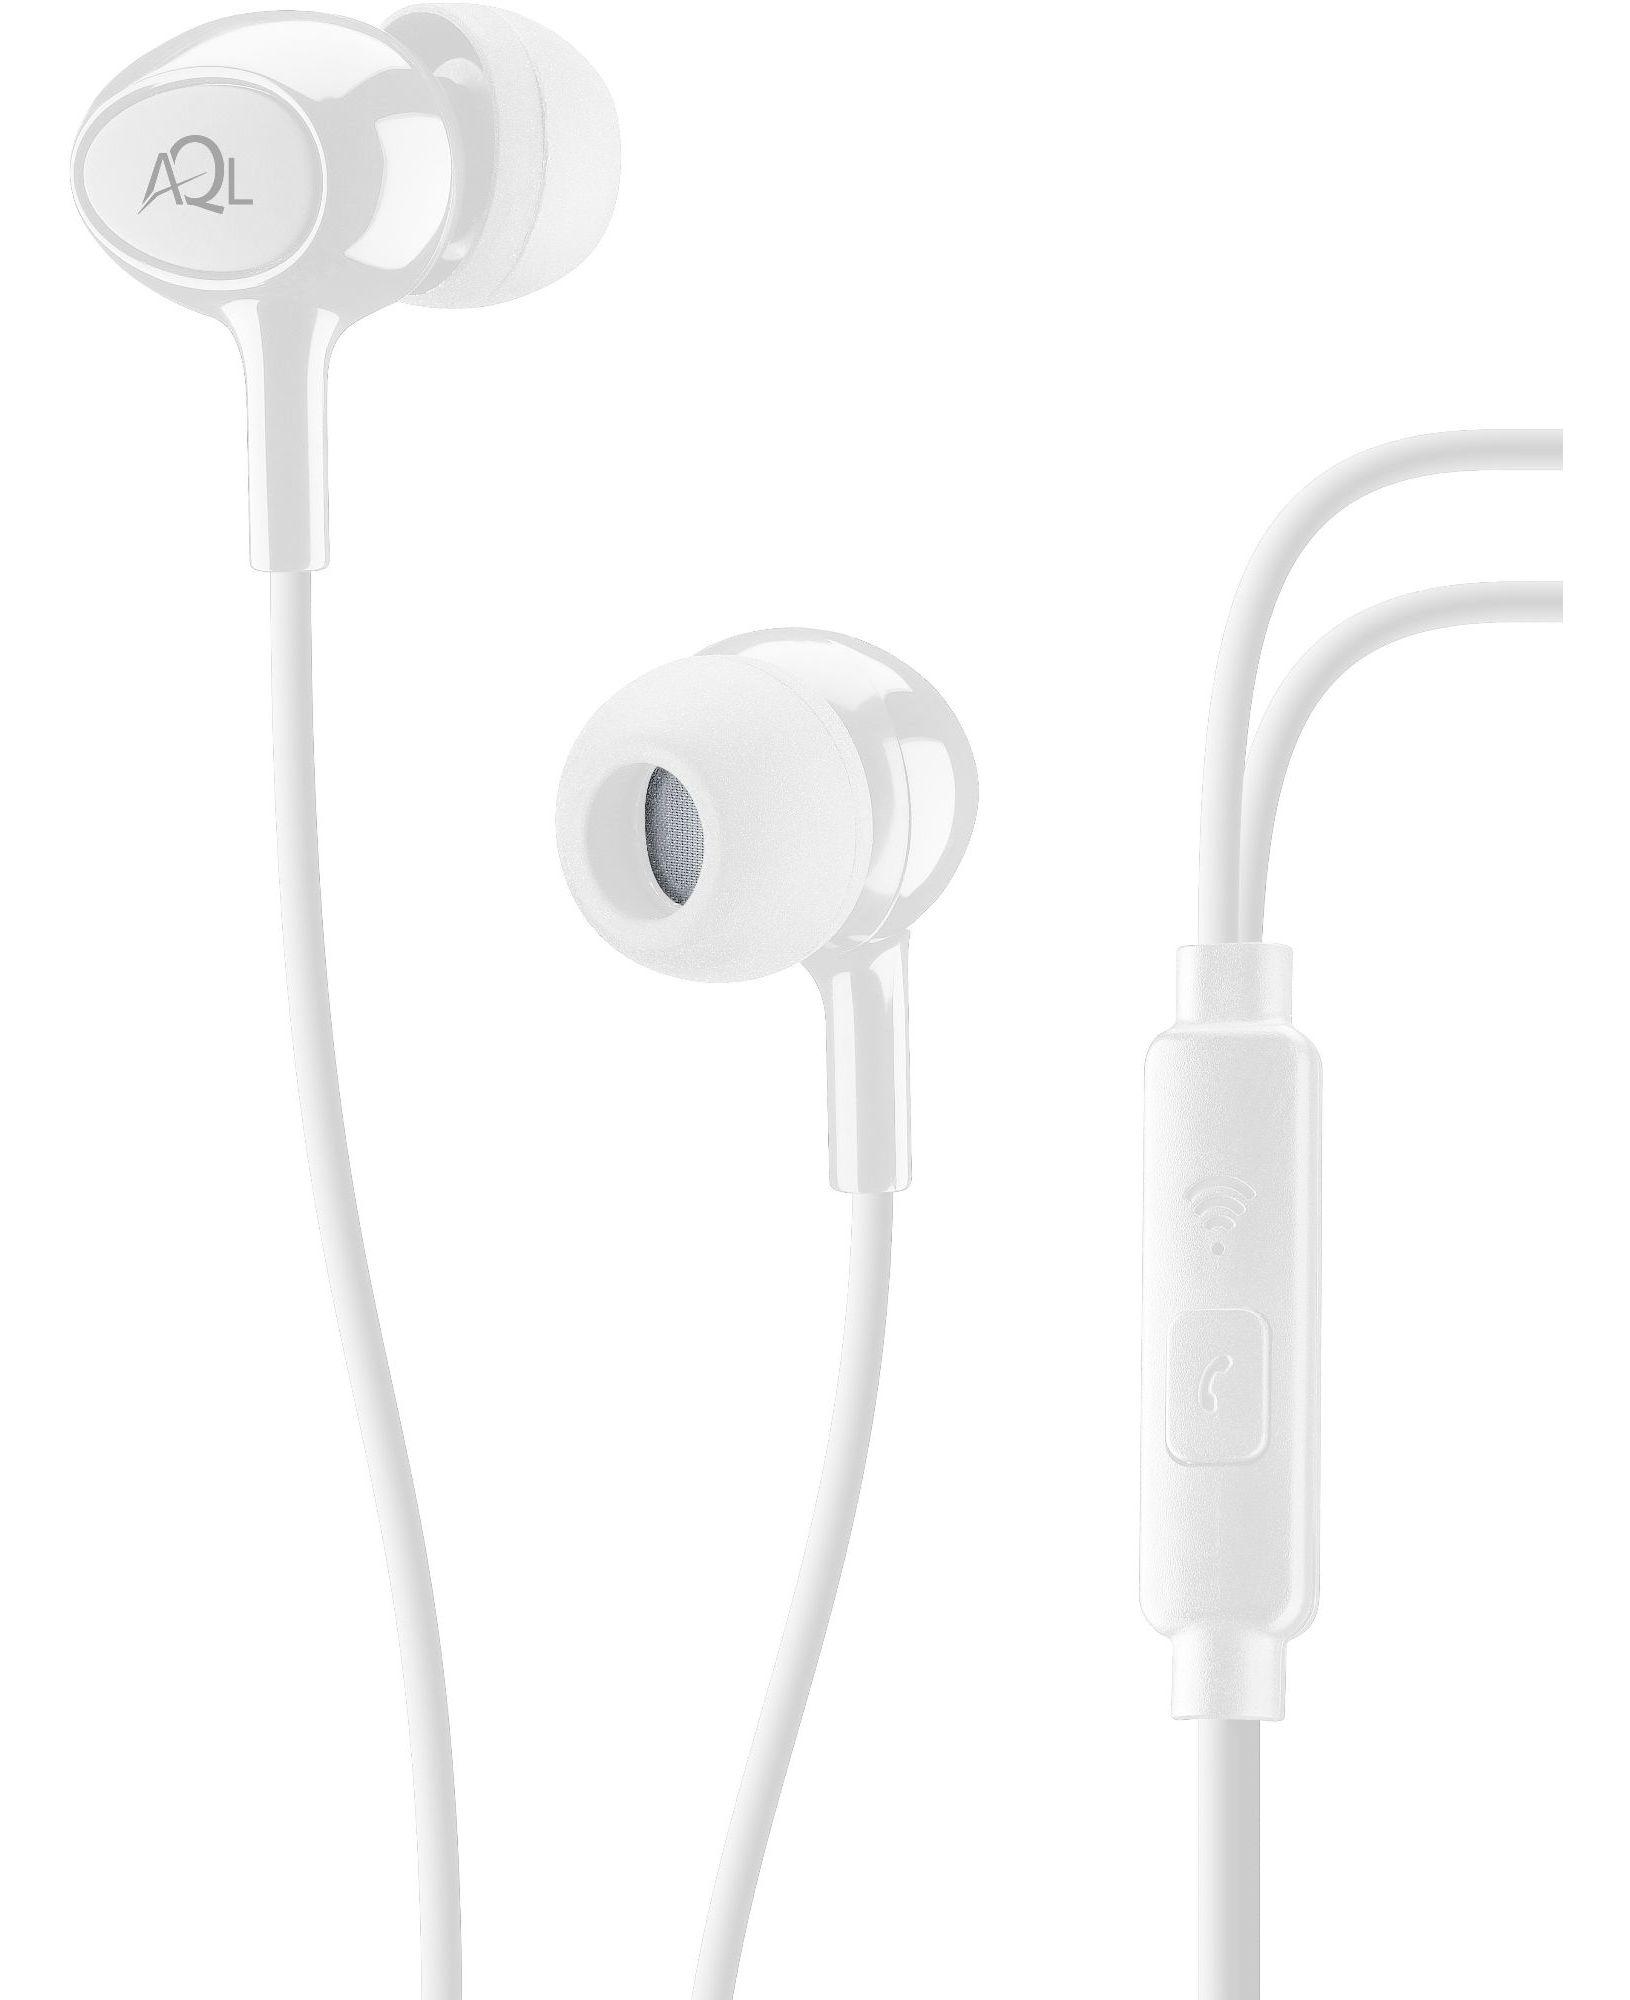 Cellularline Acoustic - Universale Auricolari pump bass in-ear Bianco